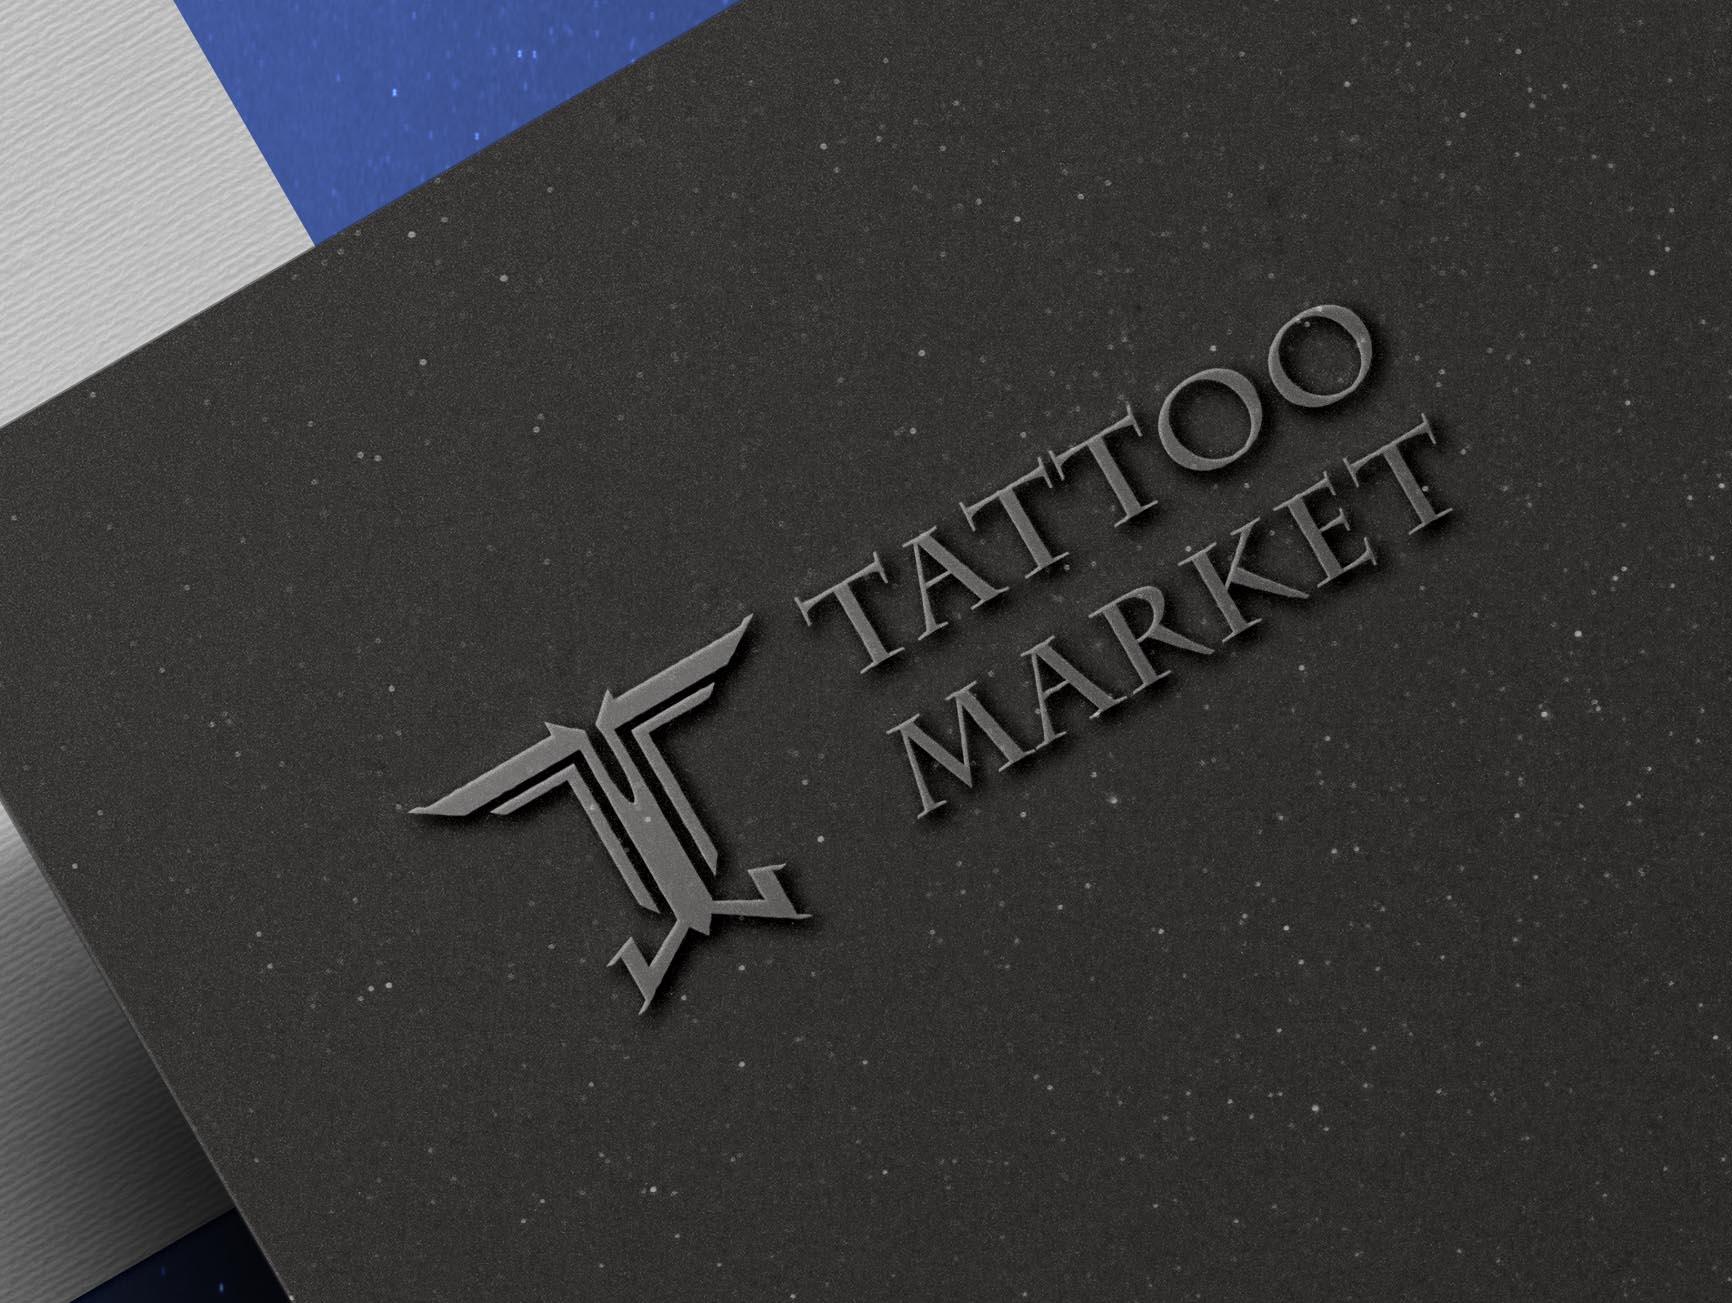 Редизайн логотипа магазина тату оборудования TattooMarket.ru фото f_1695c3a15b880517.jpg